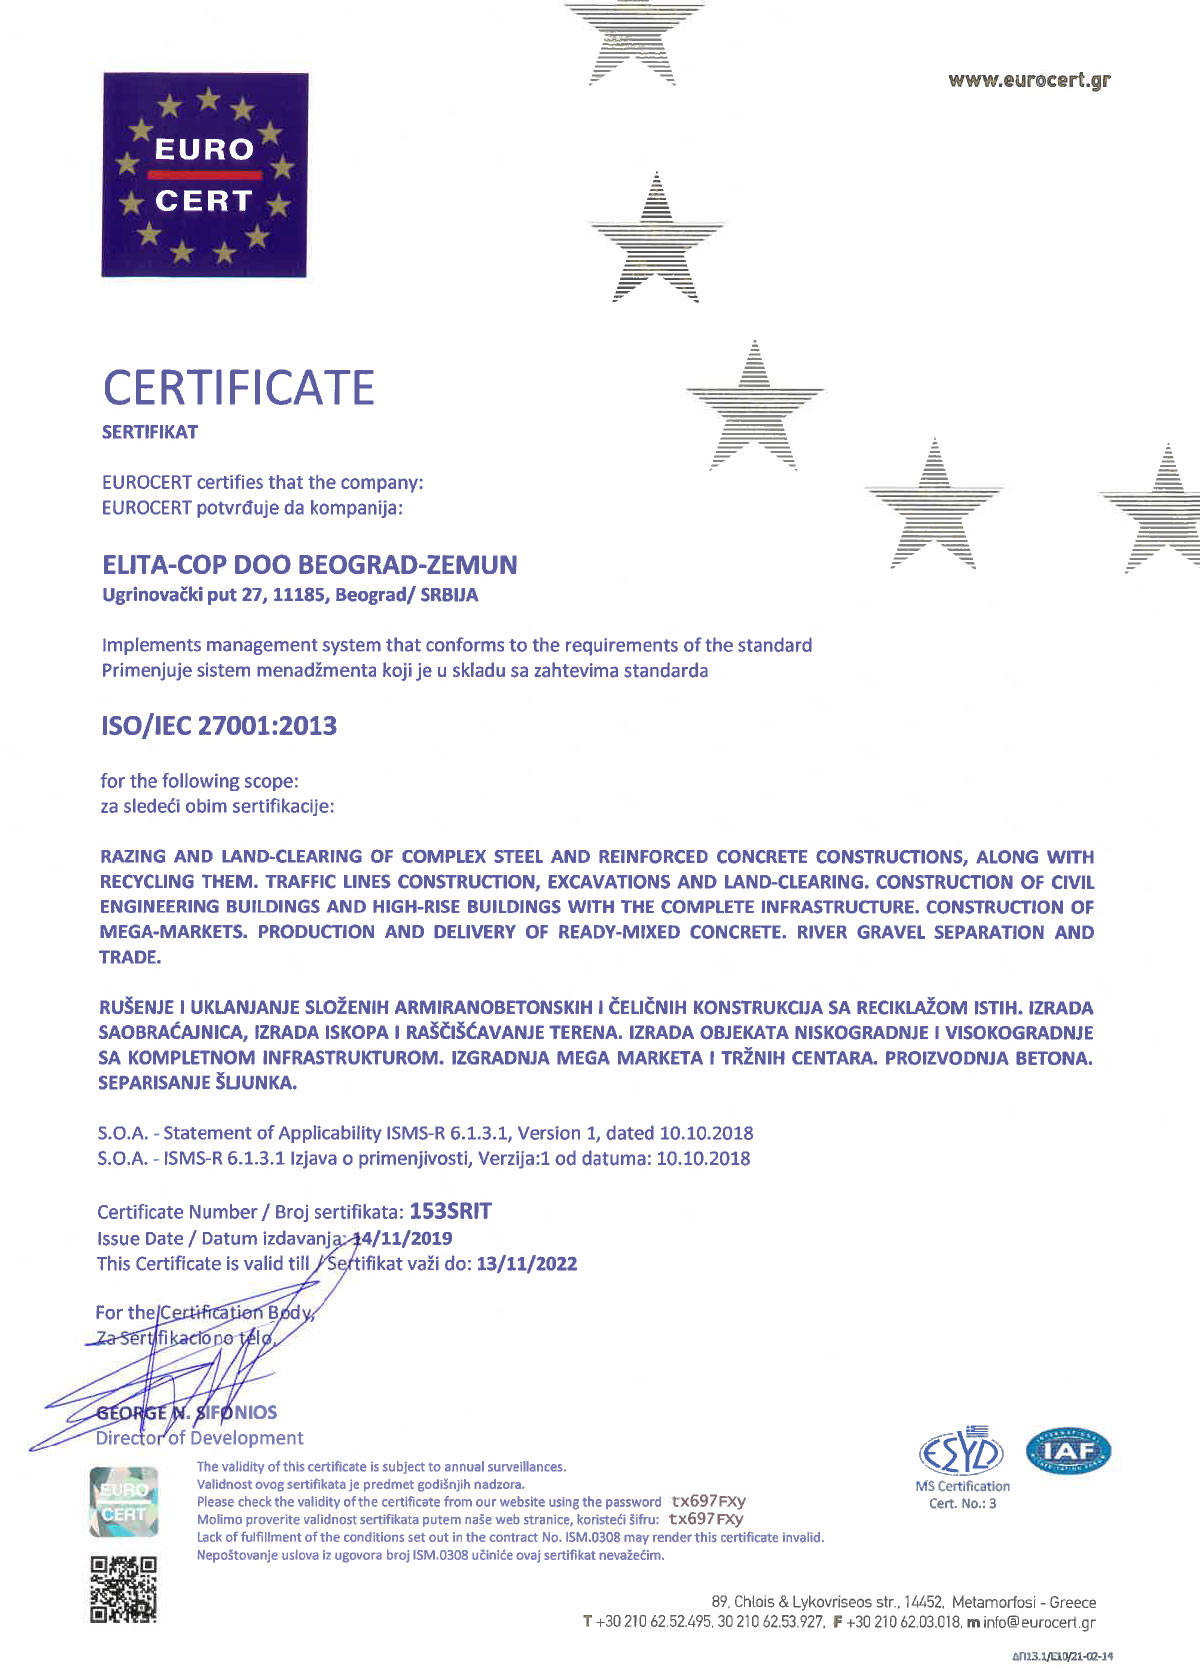 Elita Cop ISO 27001:2013